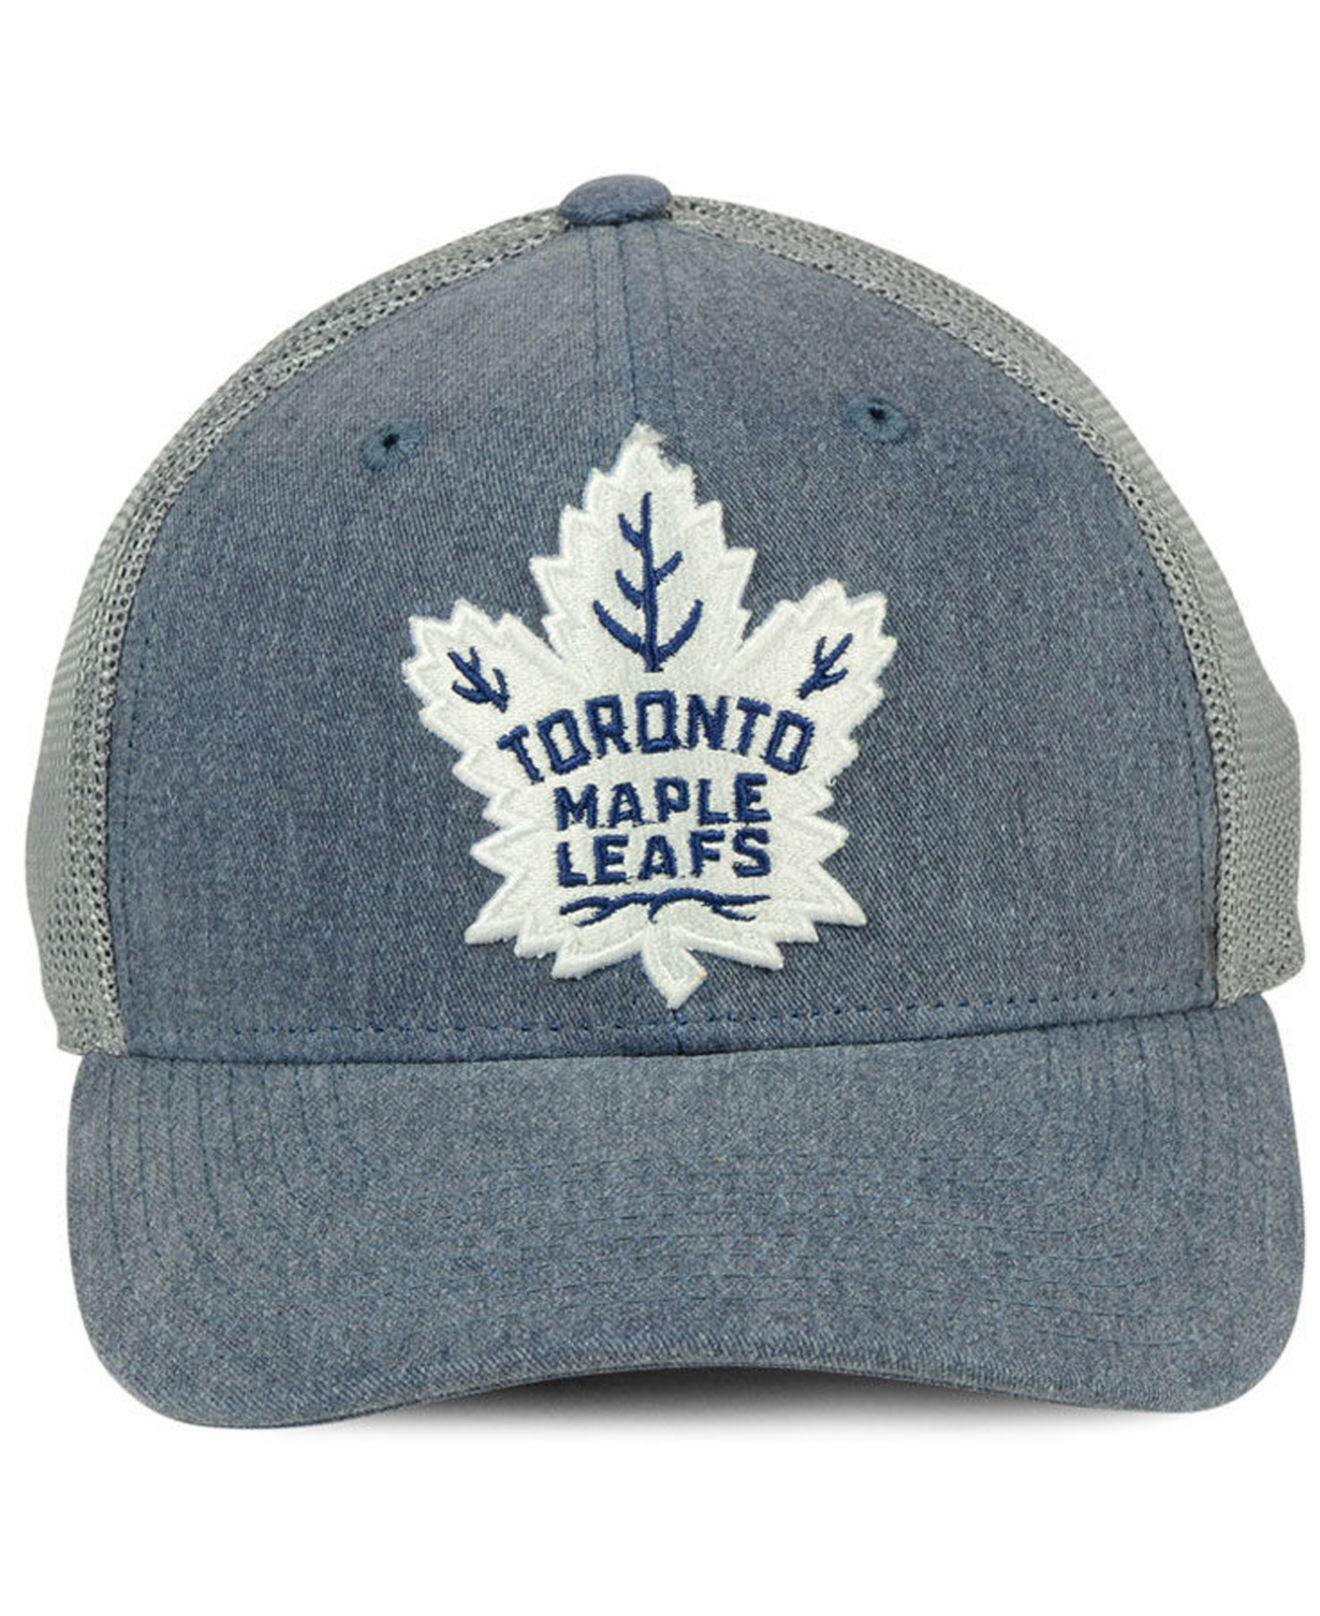 1a199e1870047 ... new arrivals lyst adidas toronto maple leafs geno flex cap in blue for  men 2c647 71f21